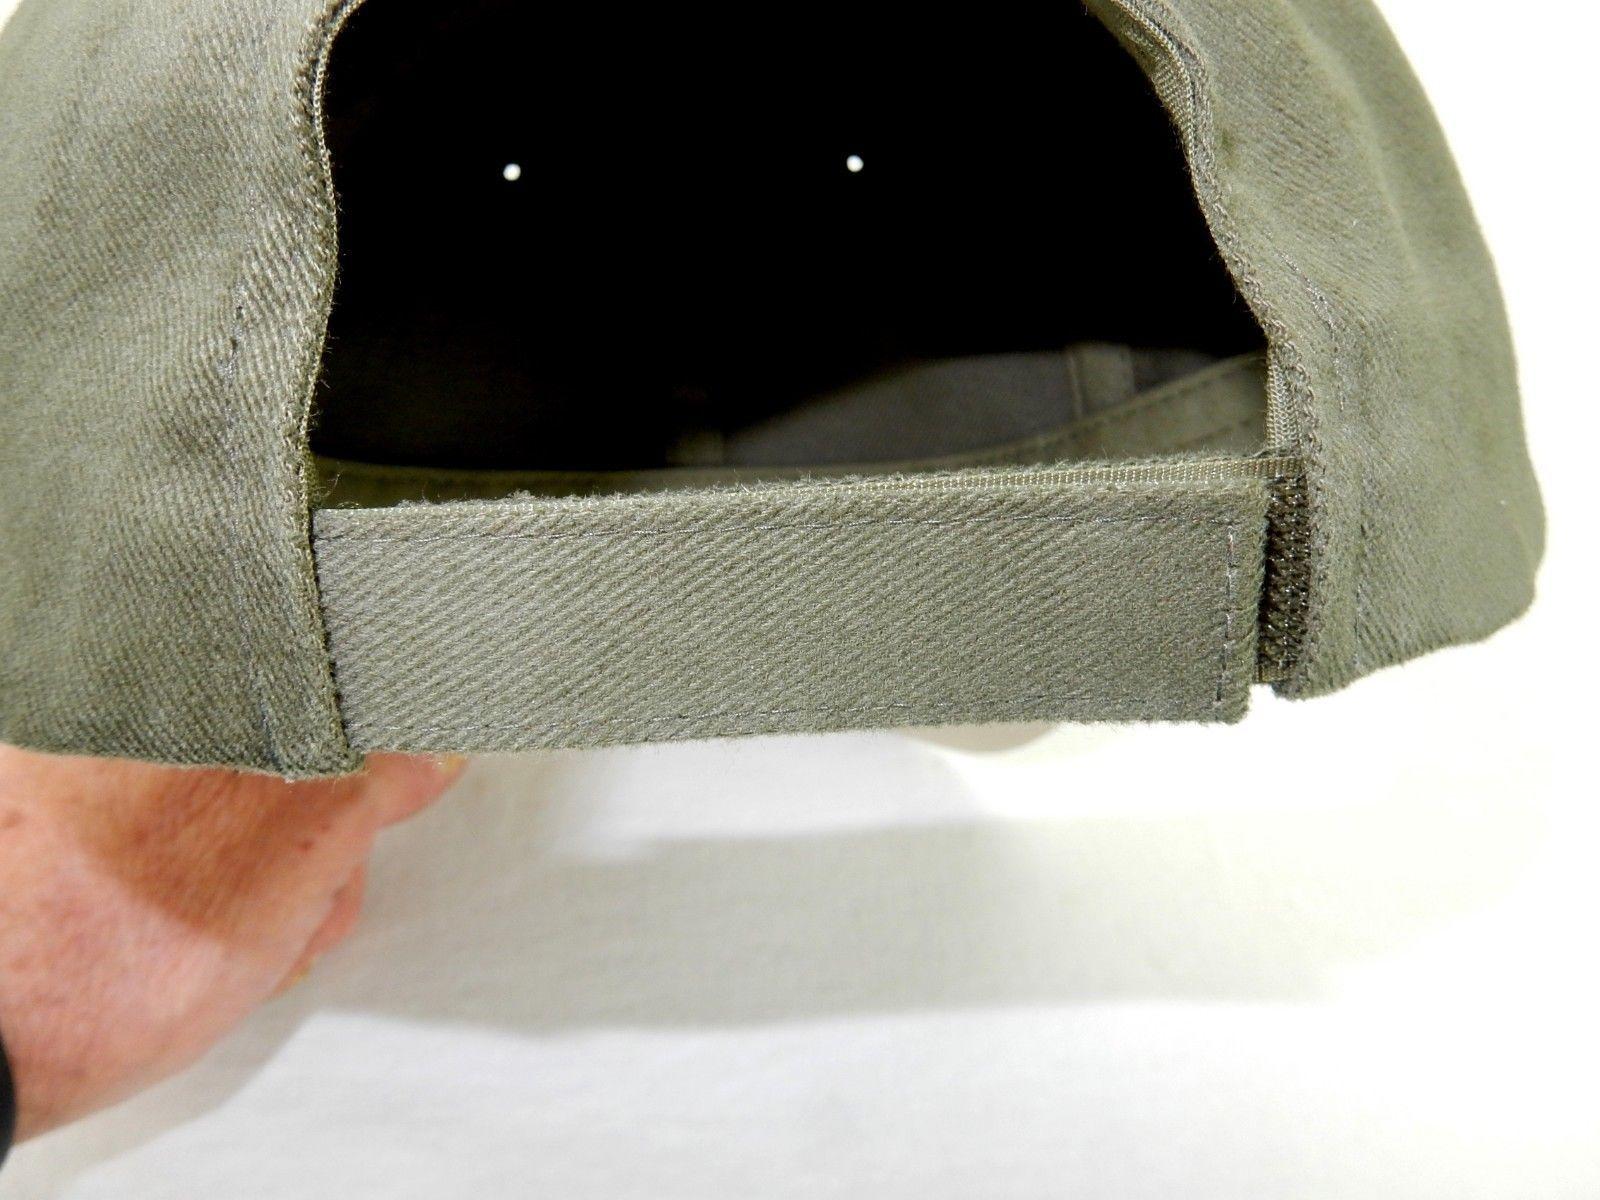 Baseball Cap, 6-Panel FlexFit w/Adjustable Headband, Cotton, Stone/Olive, #6161